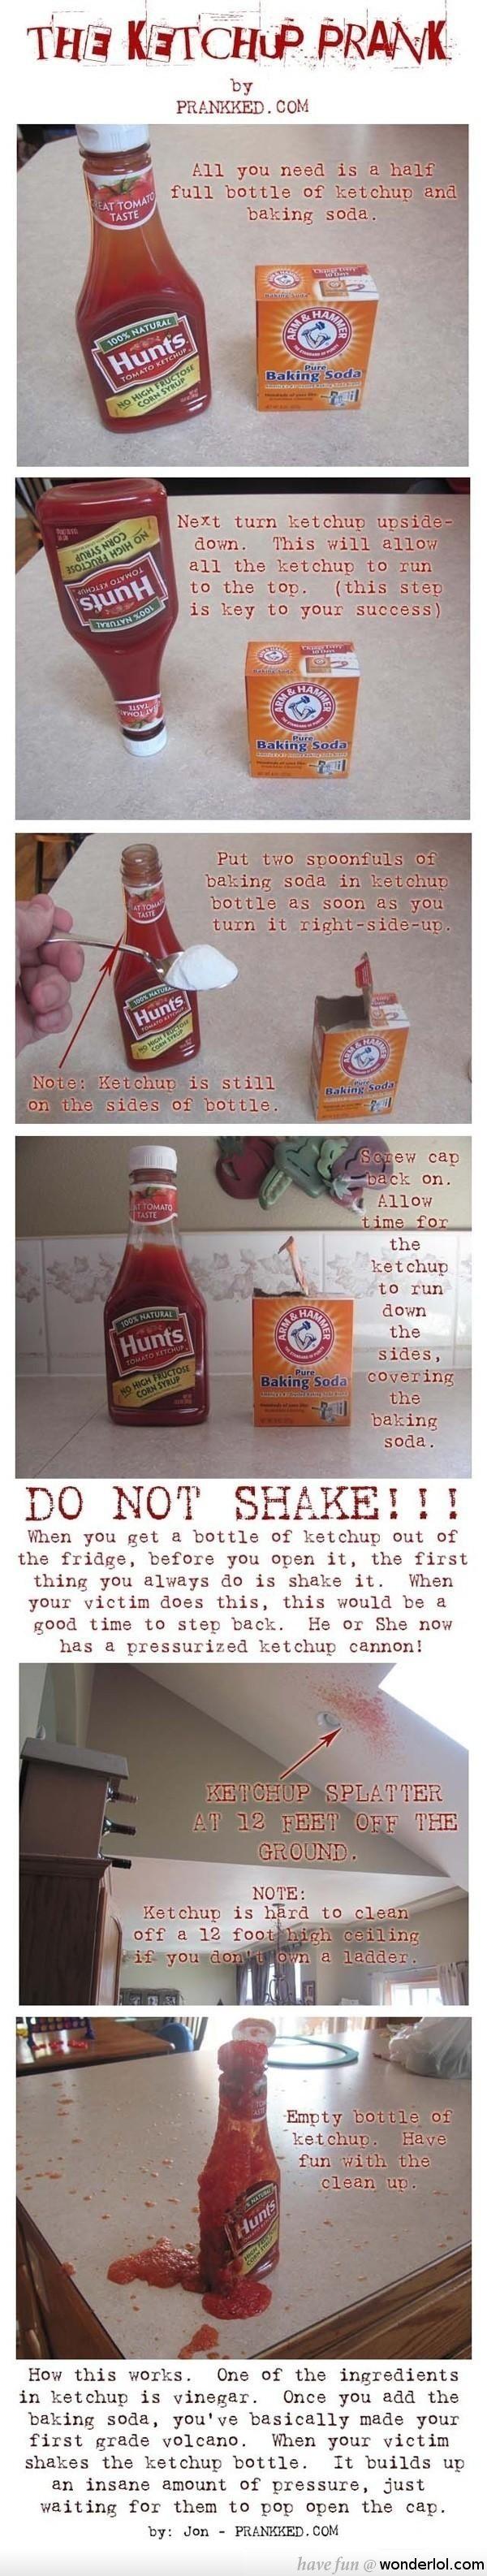 The Ketchup Prank- great April Fools Day Prank!